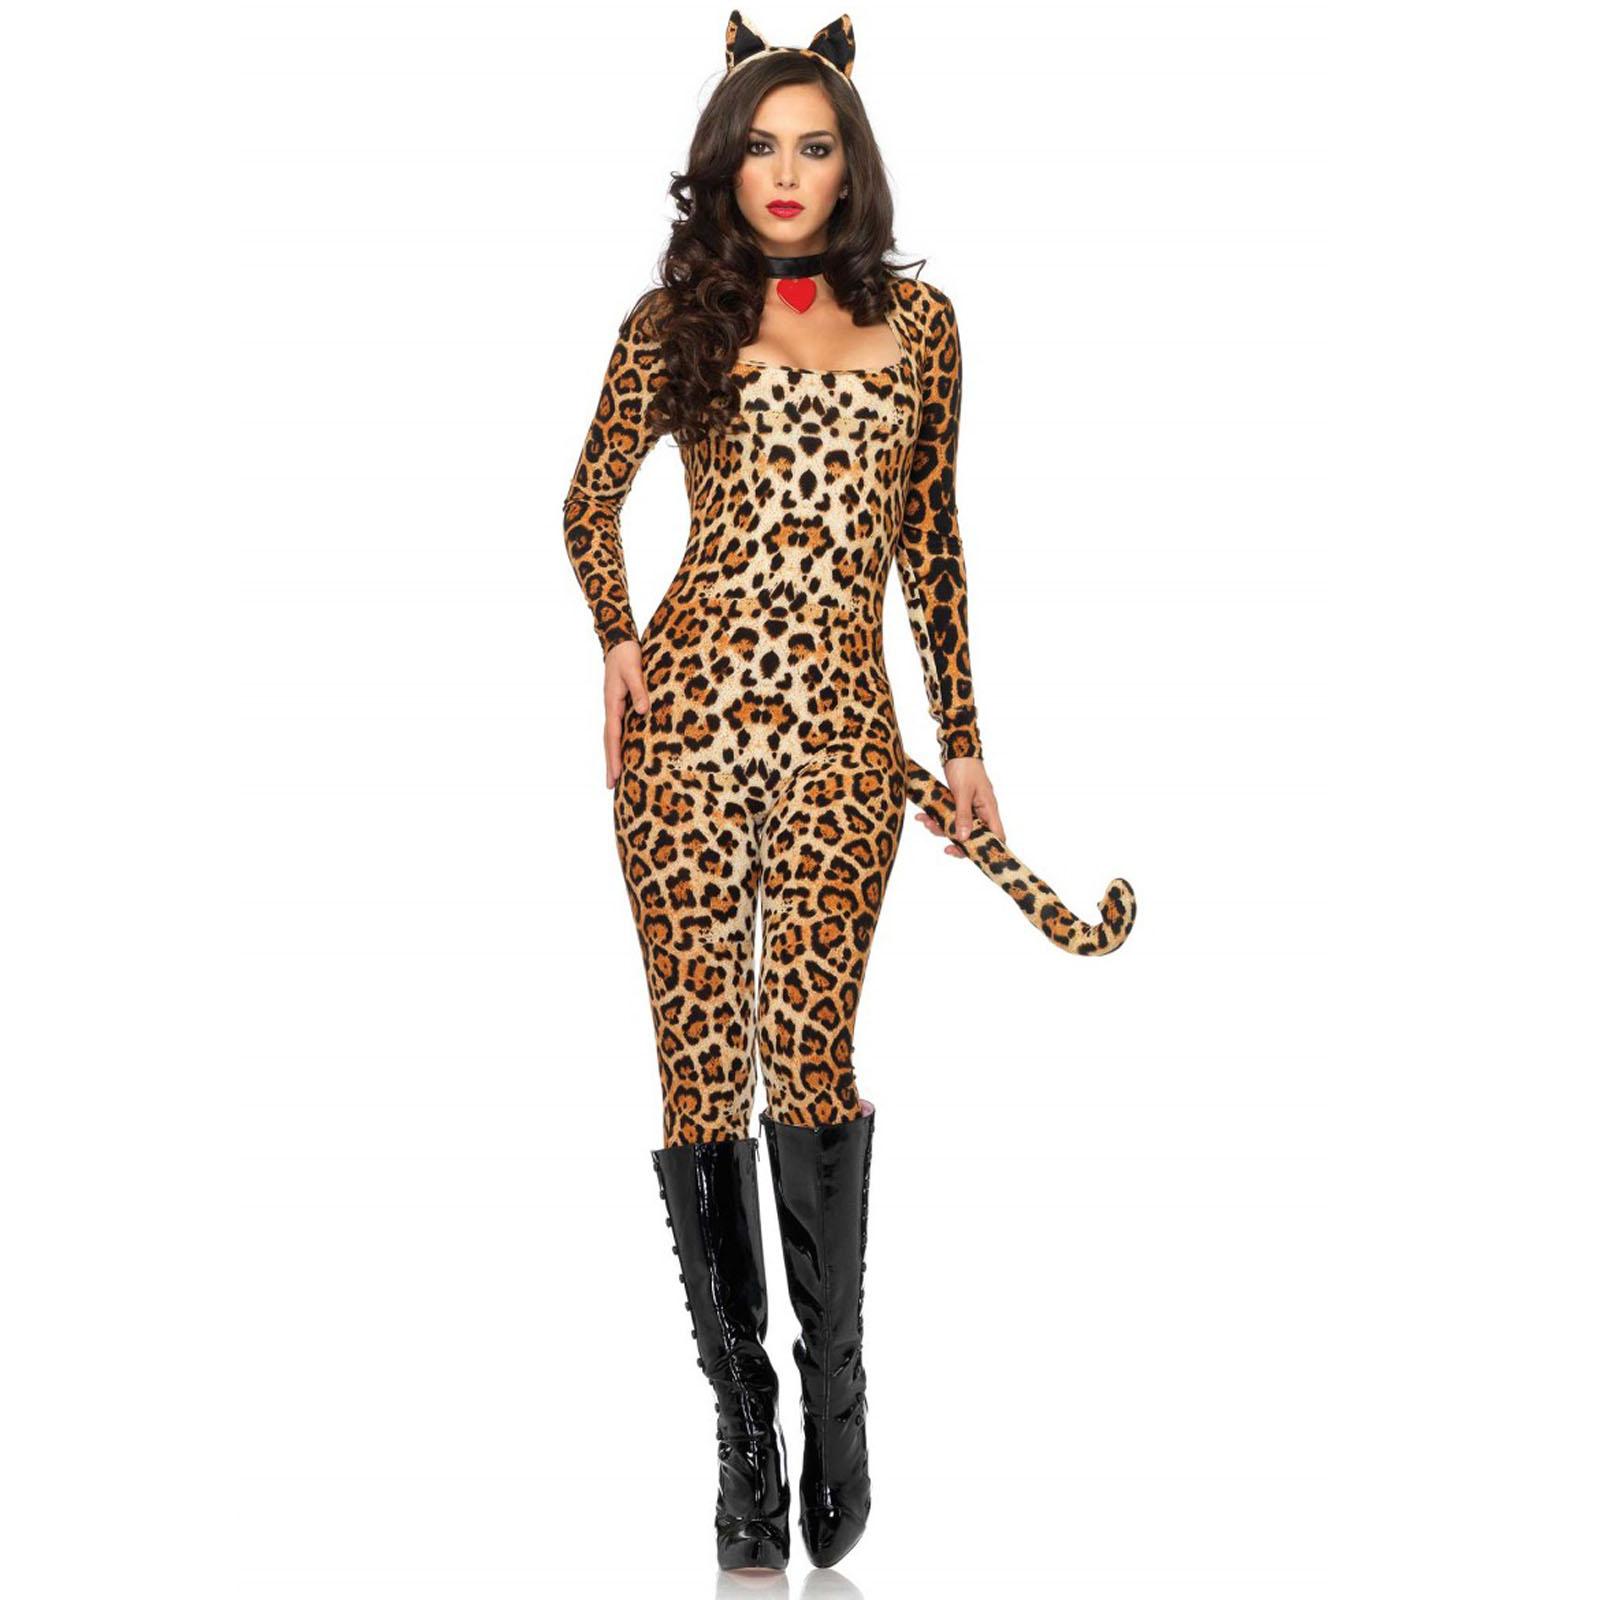 femmes cougar leg avenue sexy enterrement vie jeune fille d guisement halloween ebay. Black Bedroom Furniture Sets. Home Design Ideas